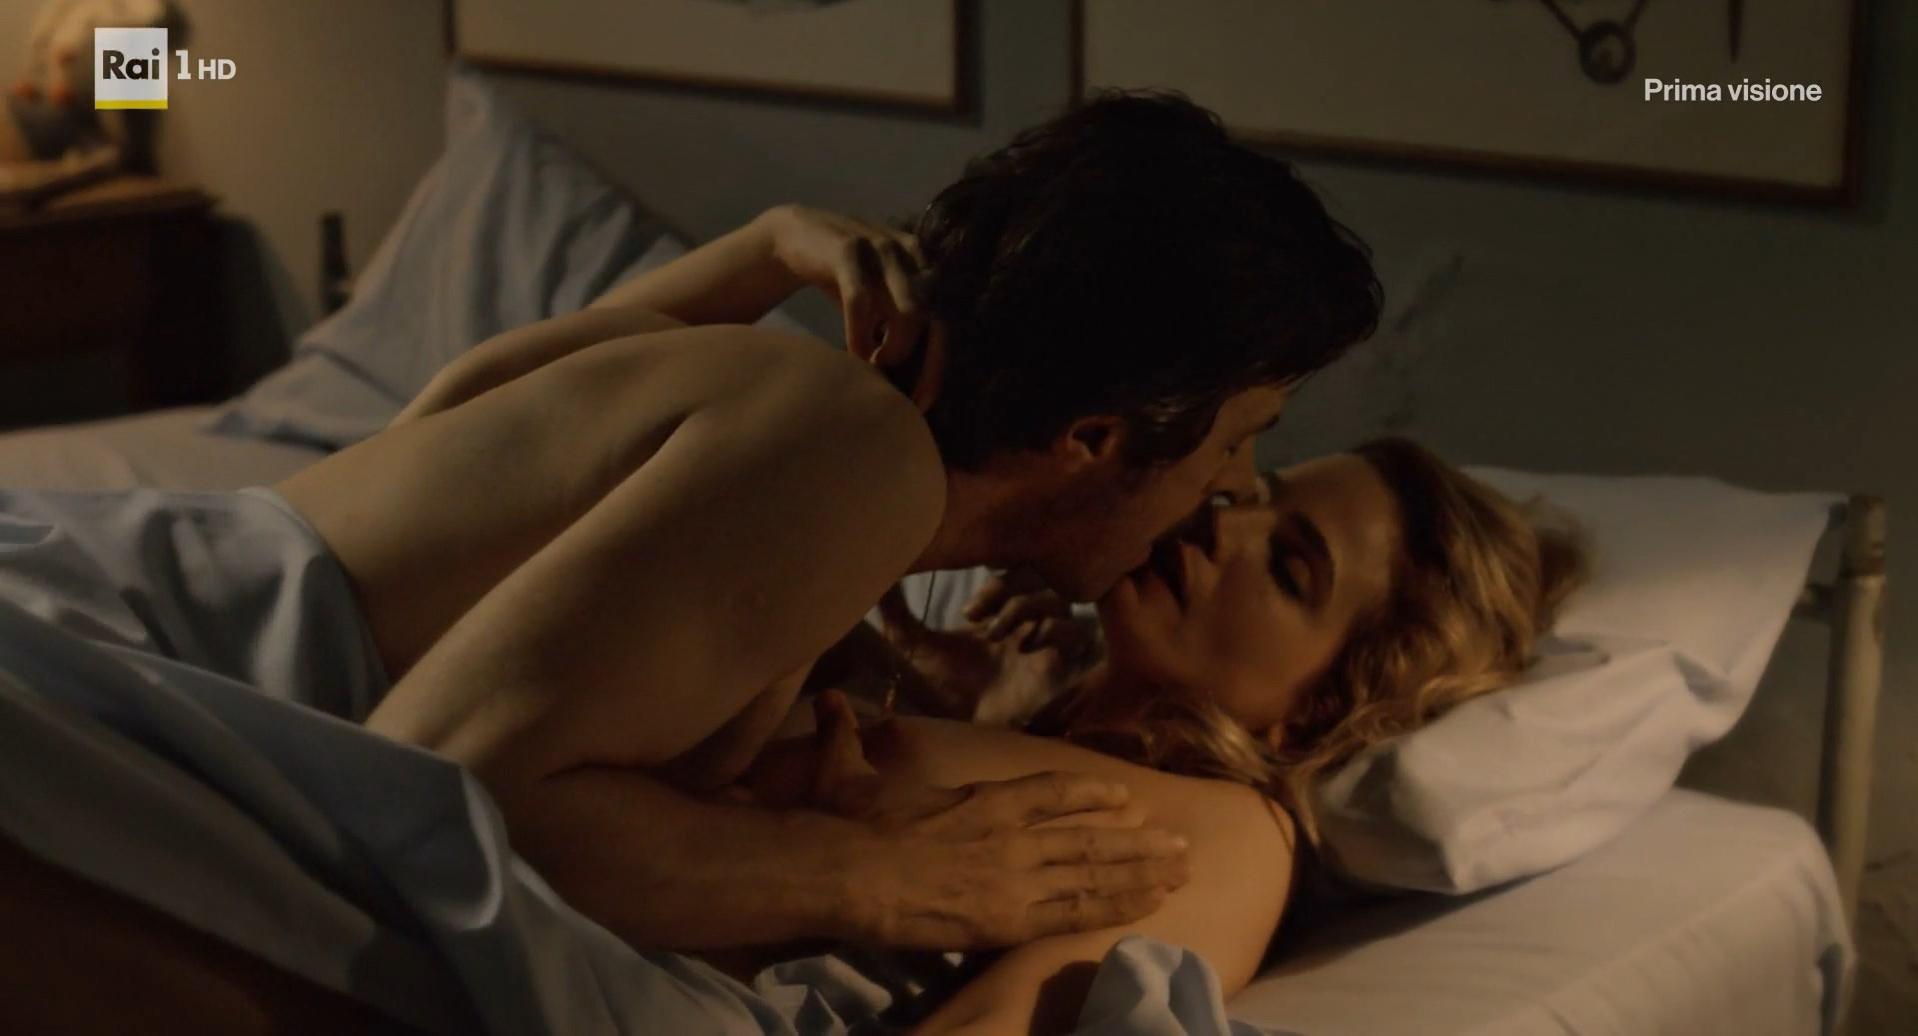 Alexandra daddario full frontal sex scene in true detective - 3 5